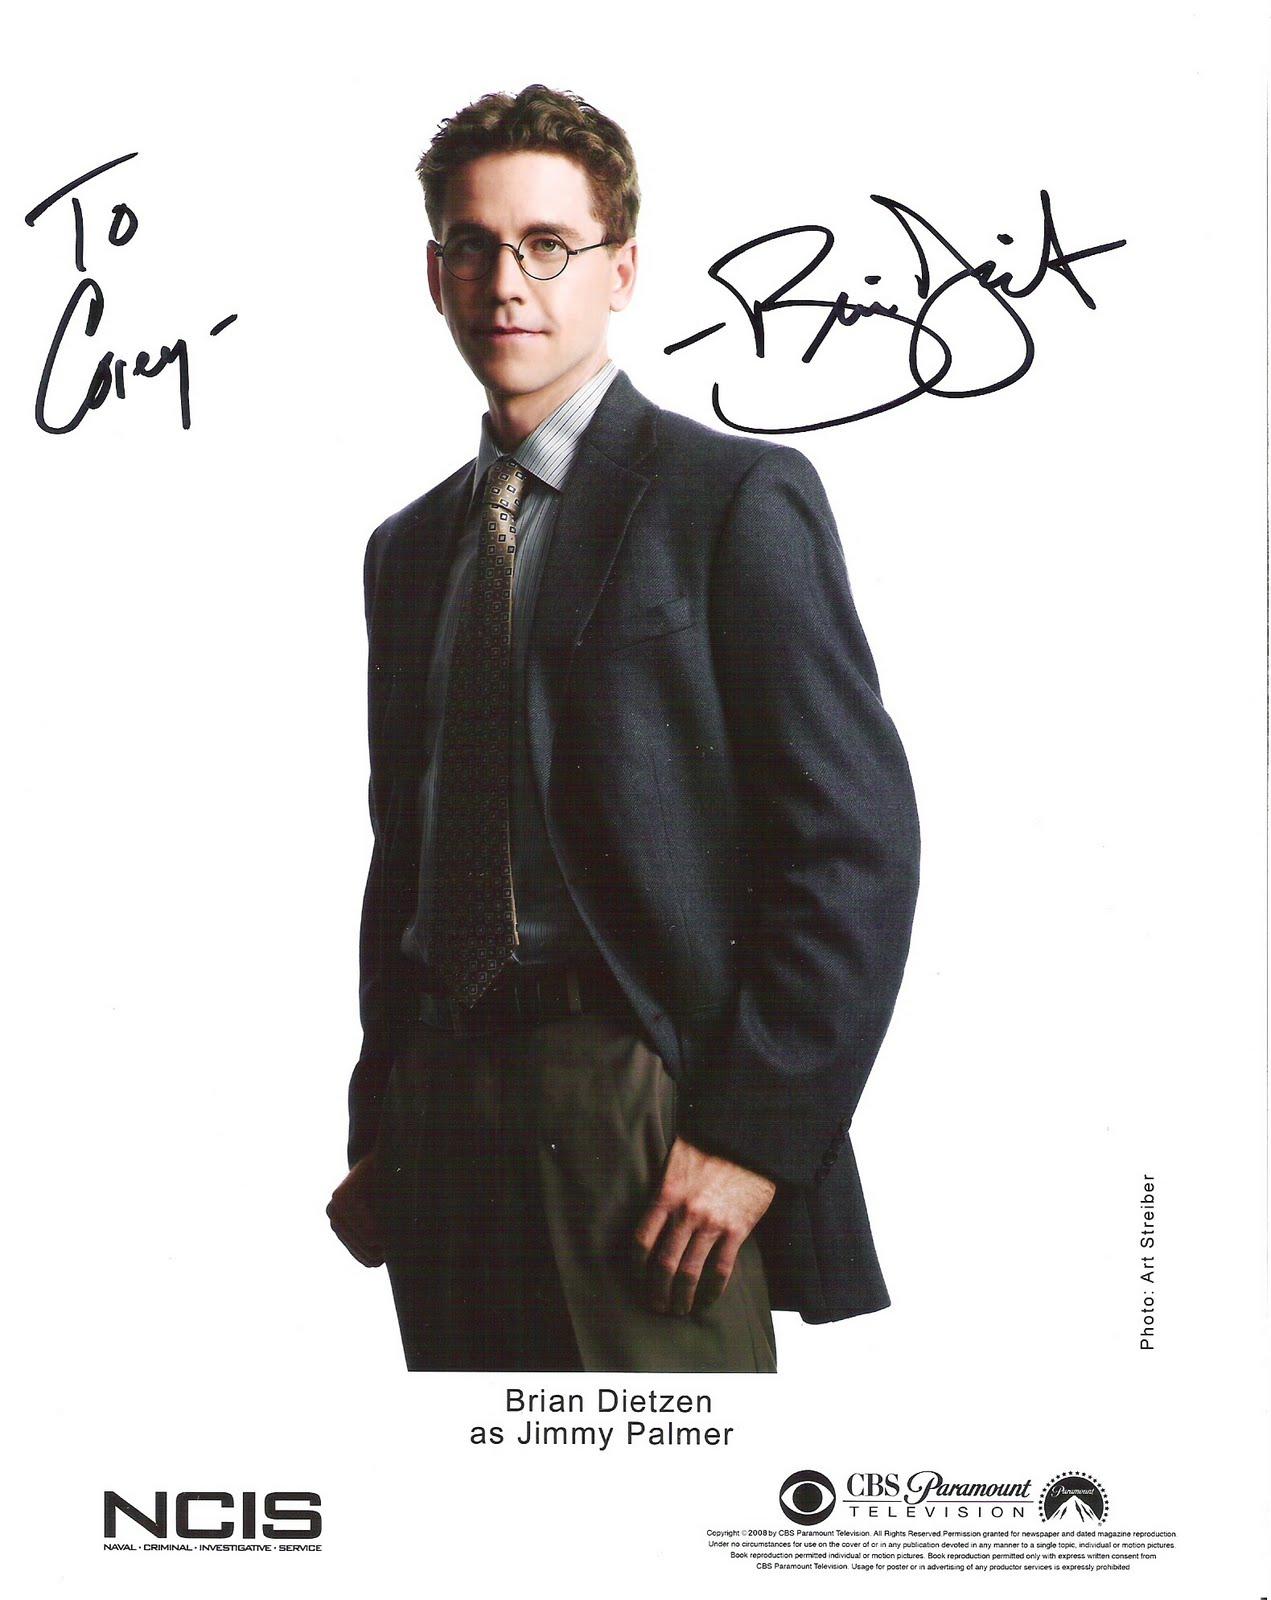 CJs World - The Autographs: Brian Dietzen - NCIS